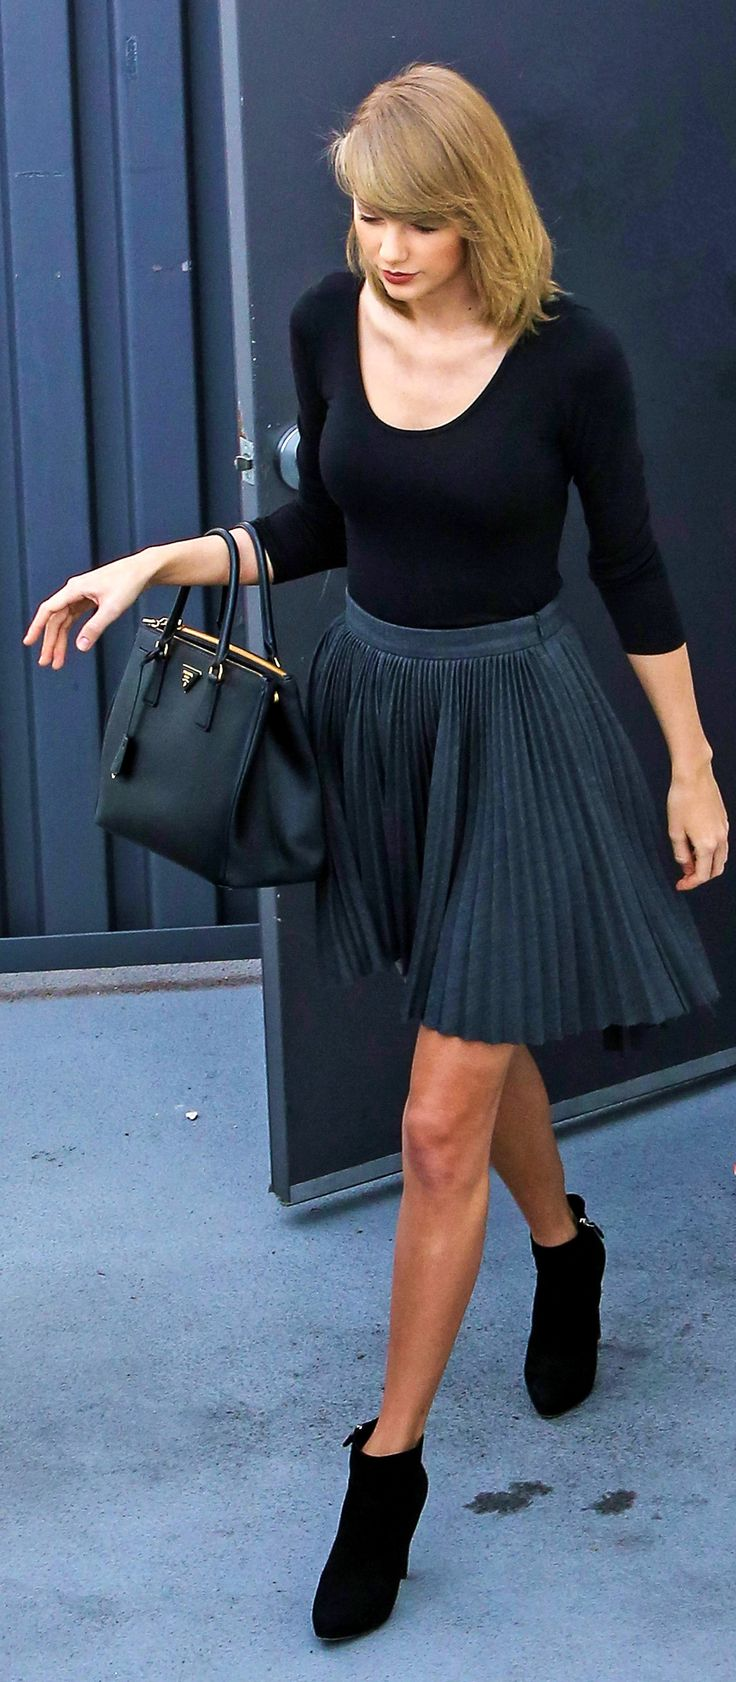 Taylor Swift ; Leaving The Boa Steakhouse, Los Angeles, January 2016 ; Cushnie et Ochs skirt, Prada boots & Prada bag